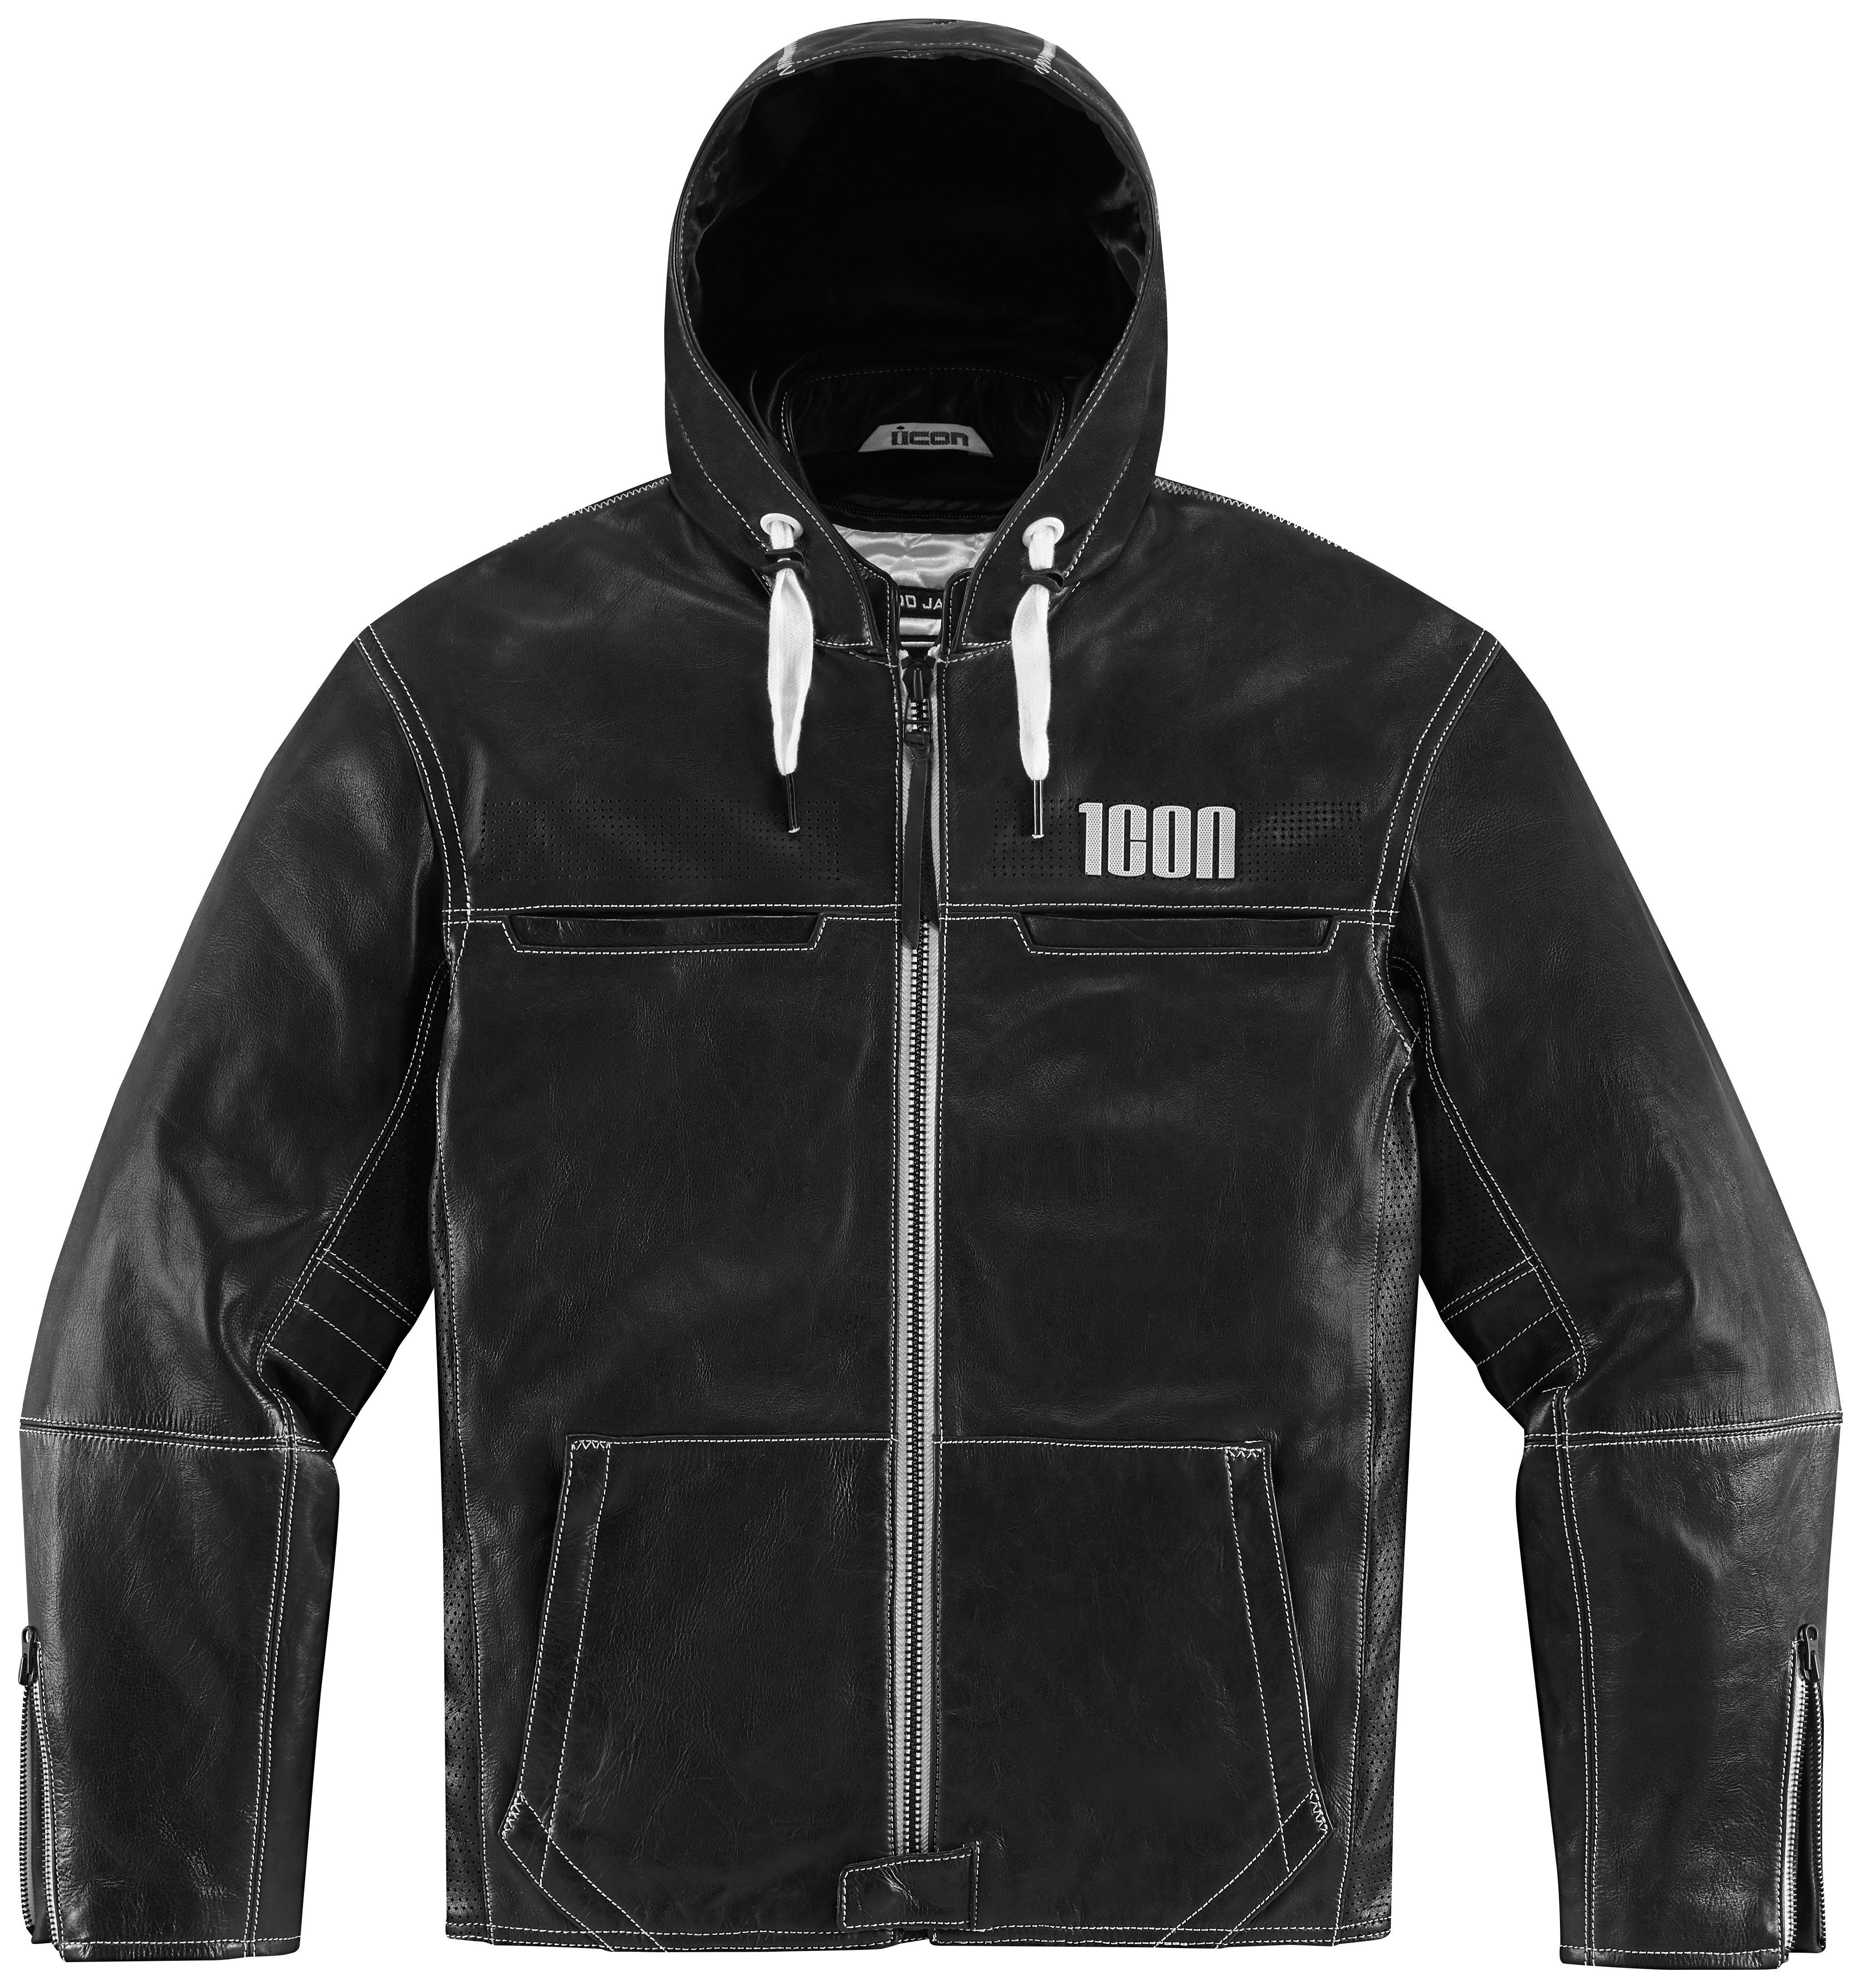 Motorcycle jacket with hoodie